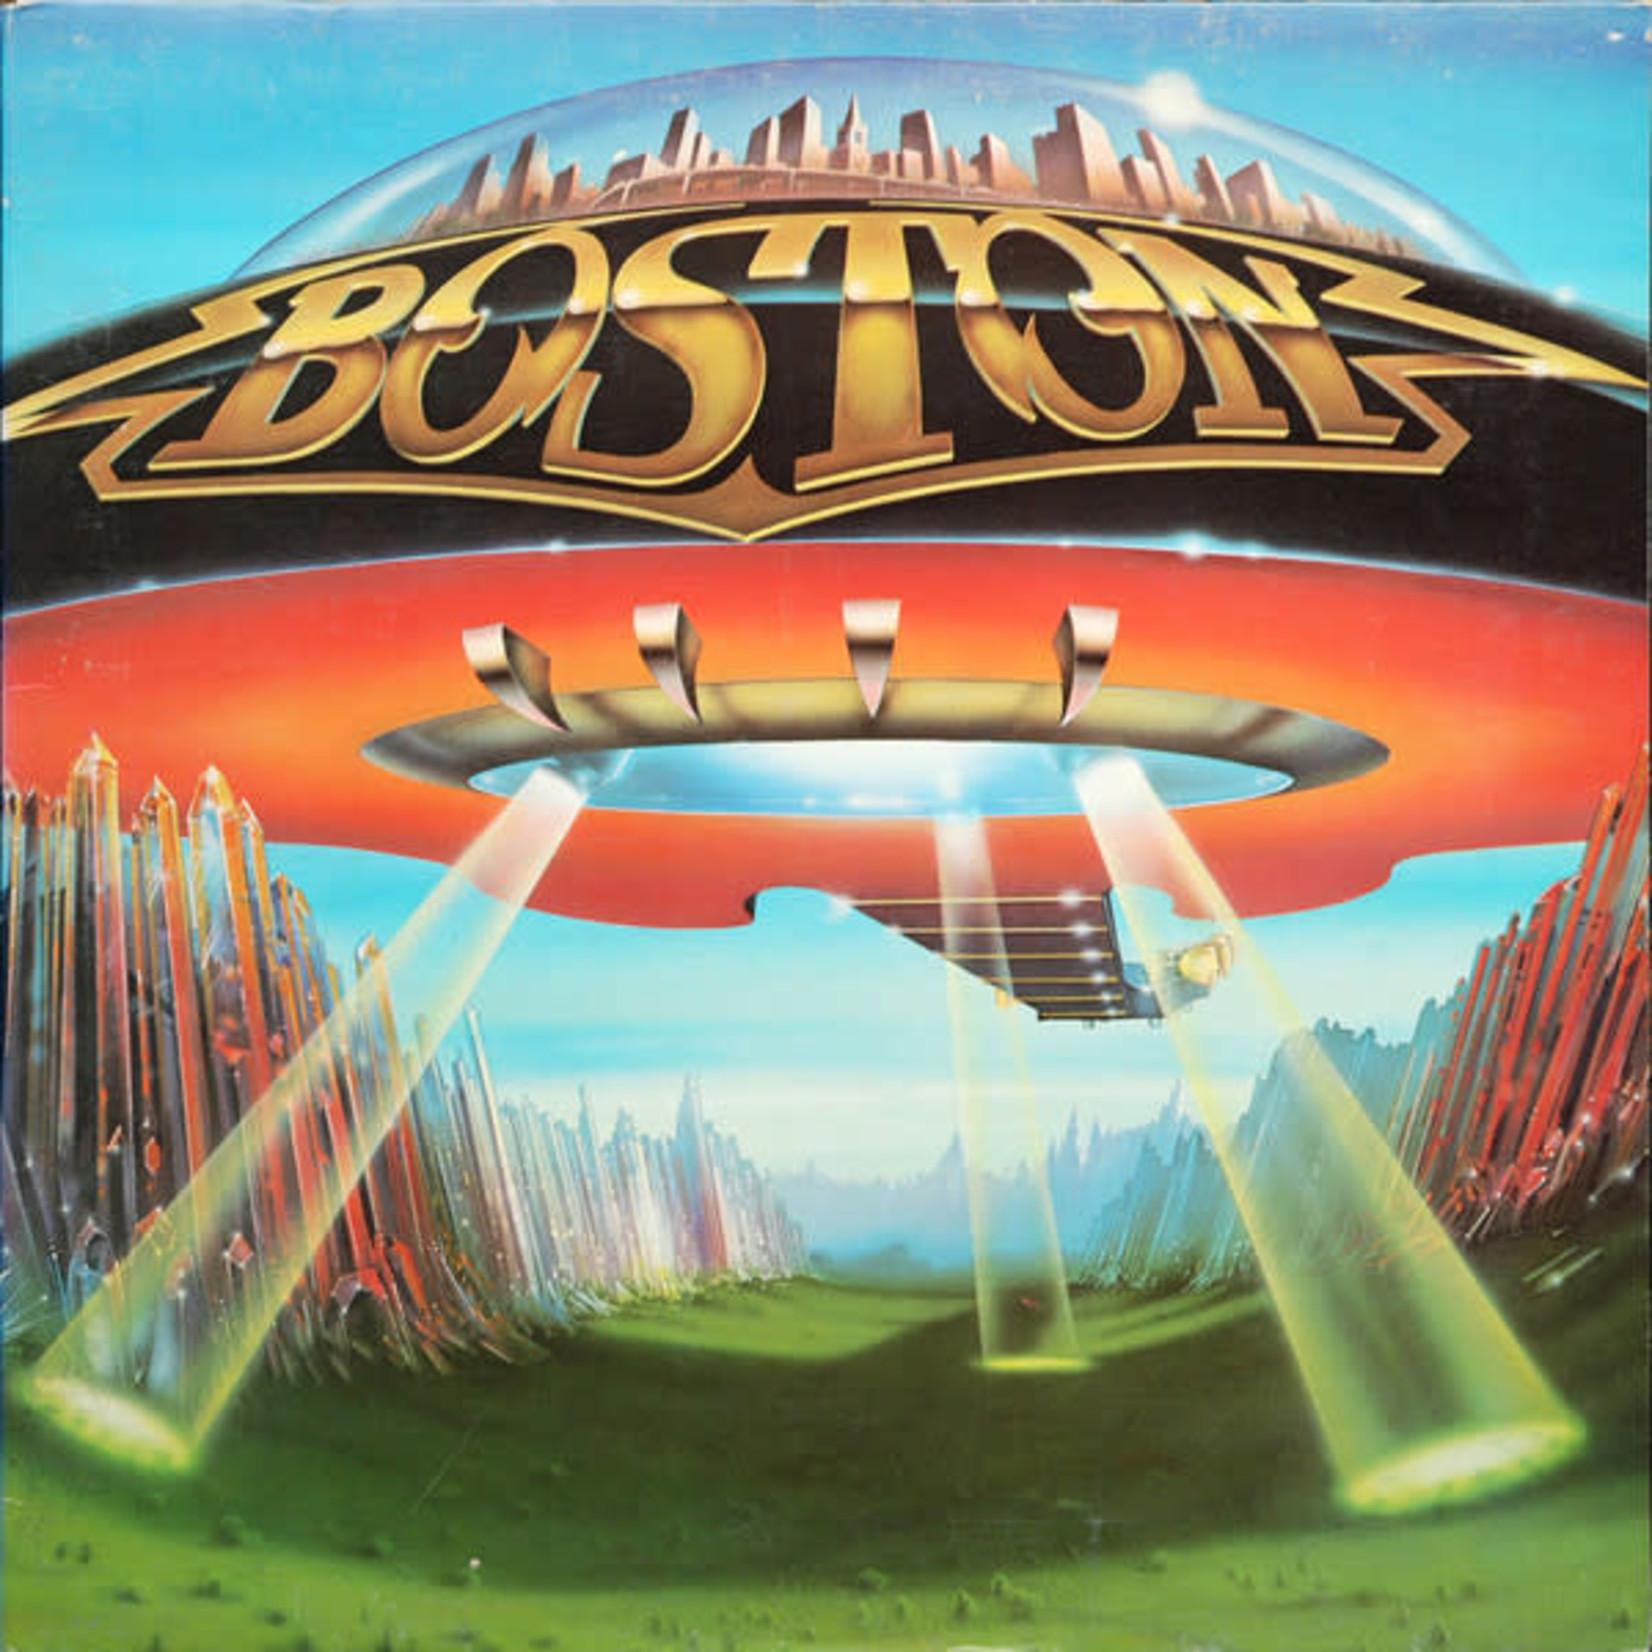 [Vintage] Boston: Don't Look Back